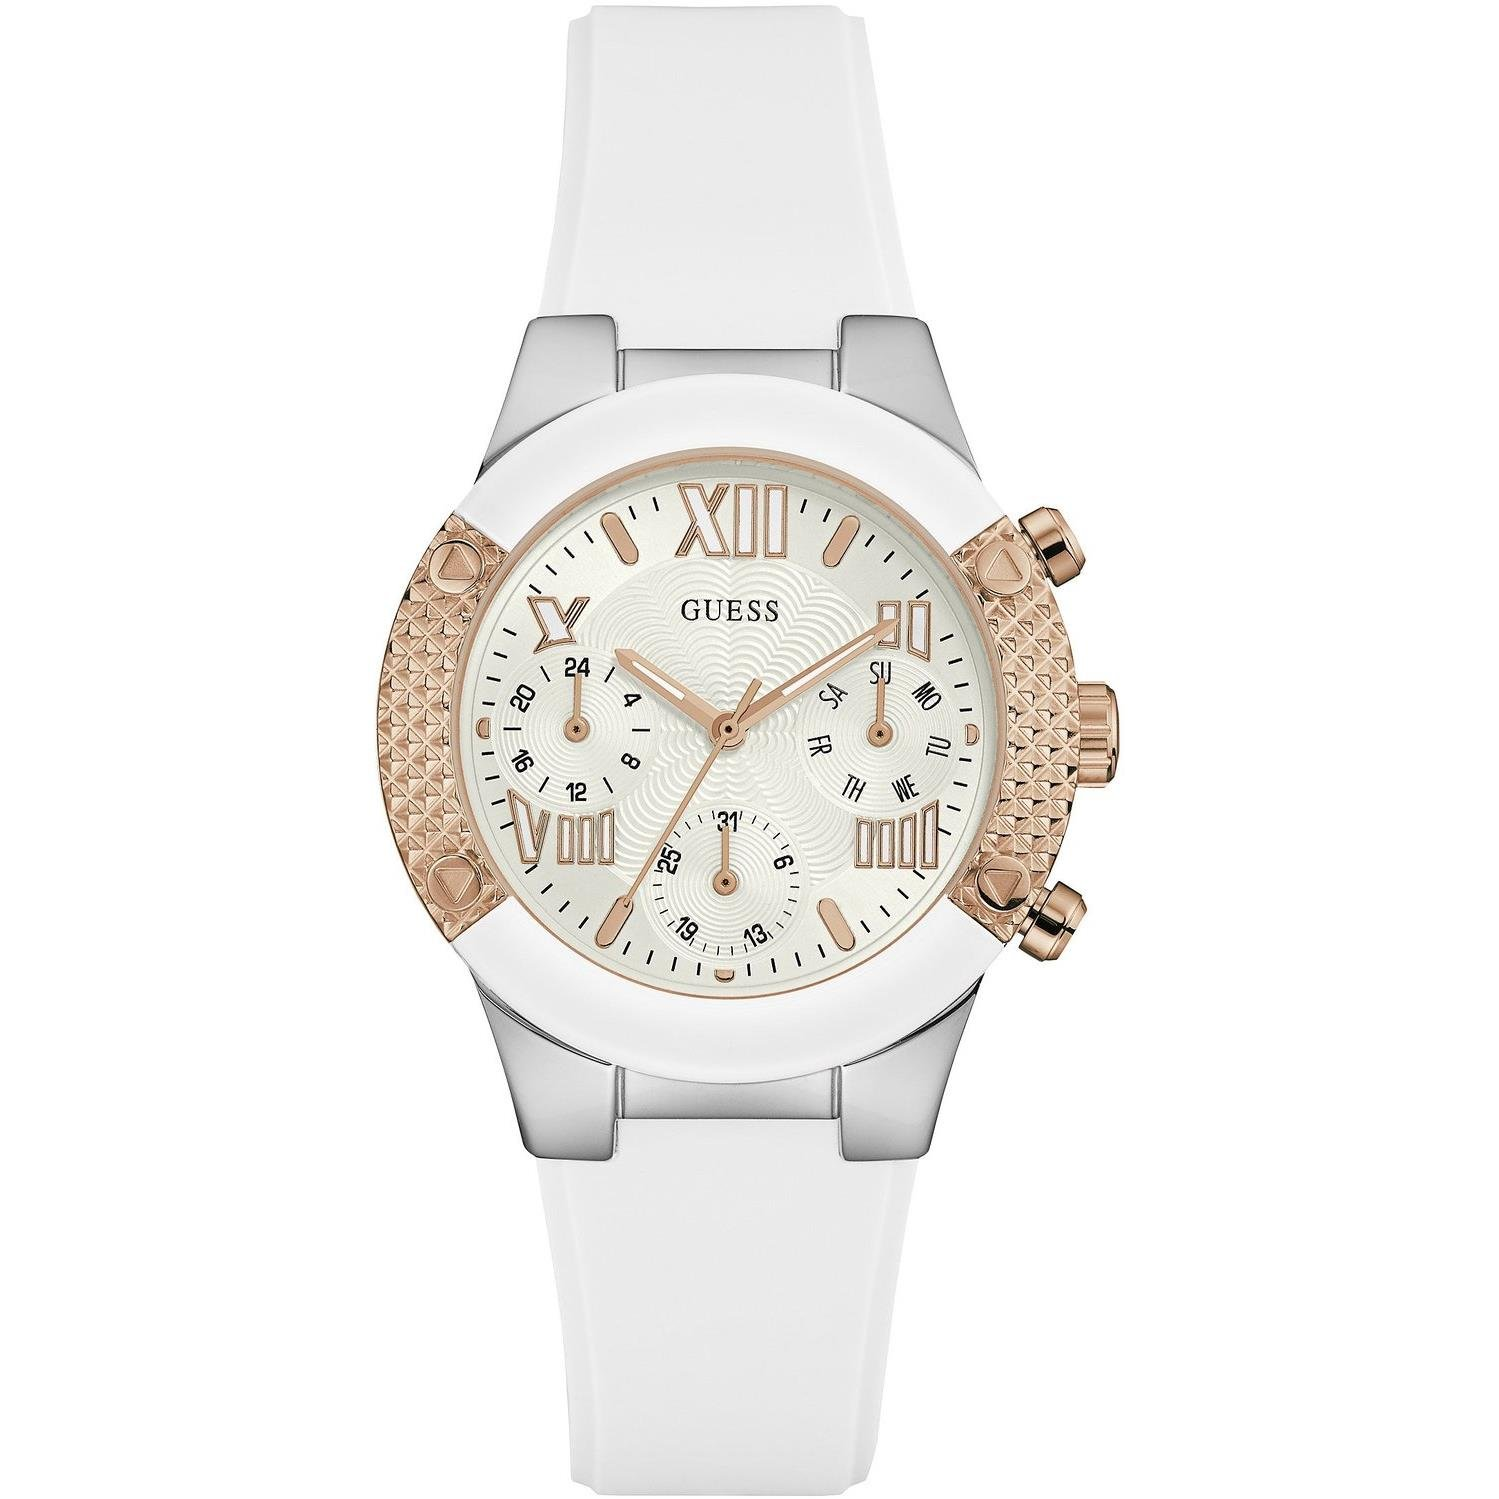 Guess Women s Quartz Watch W0773L1 with Metal Strap